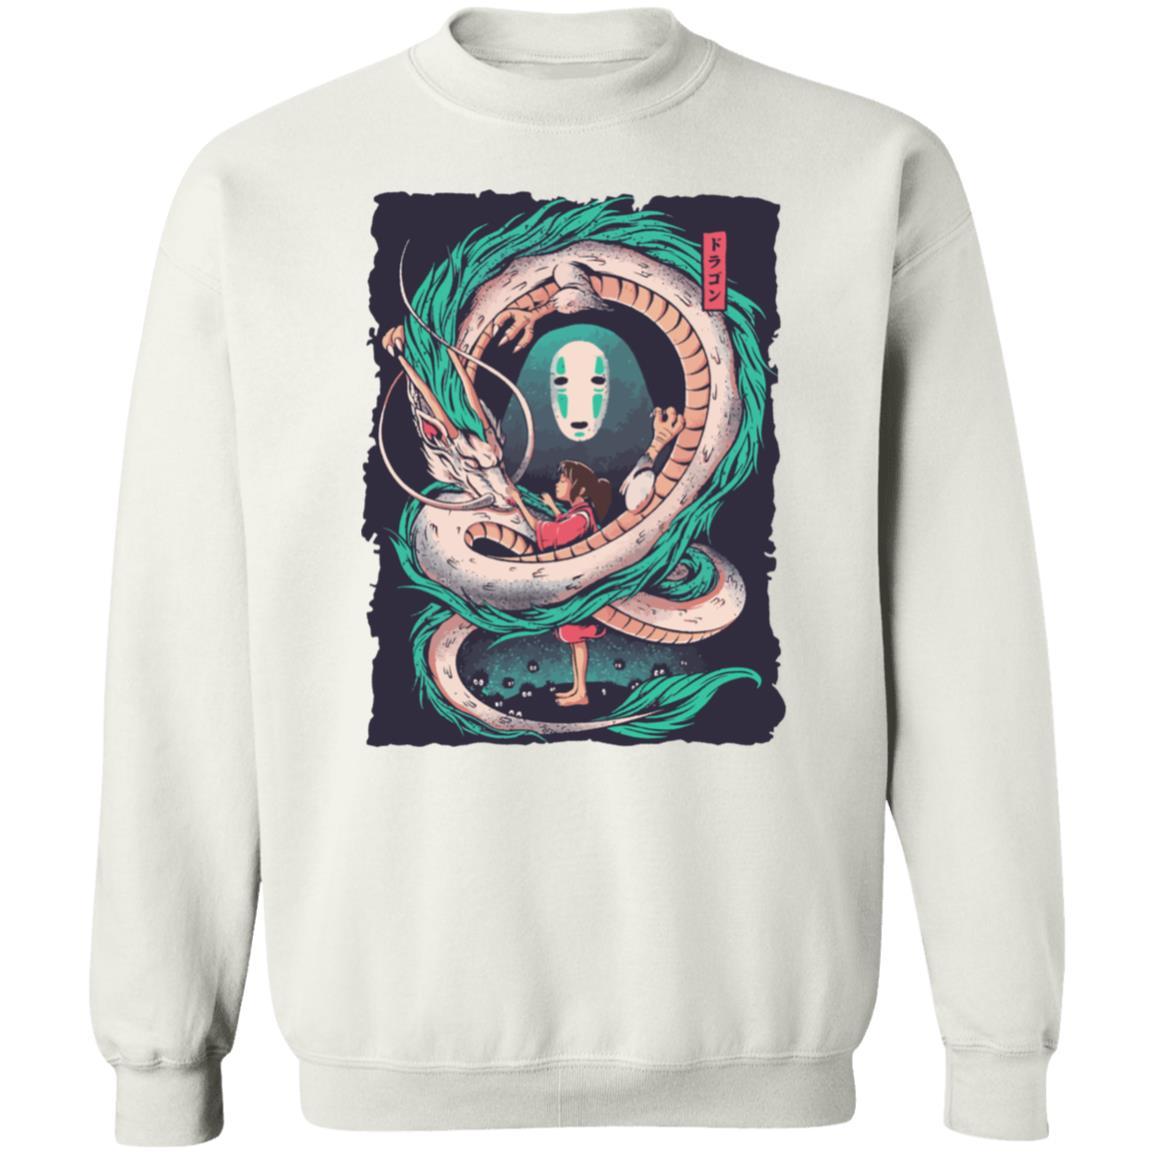 Spirited Away – Haku Dragon with Sen and No Face Sweatshirt